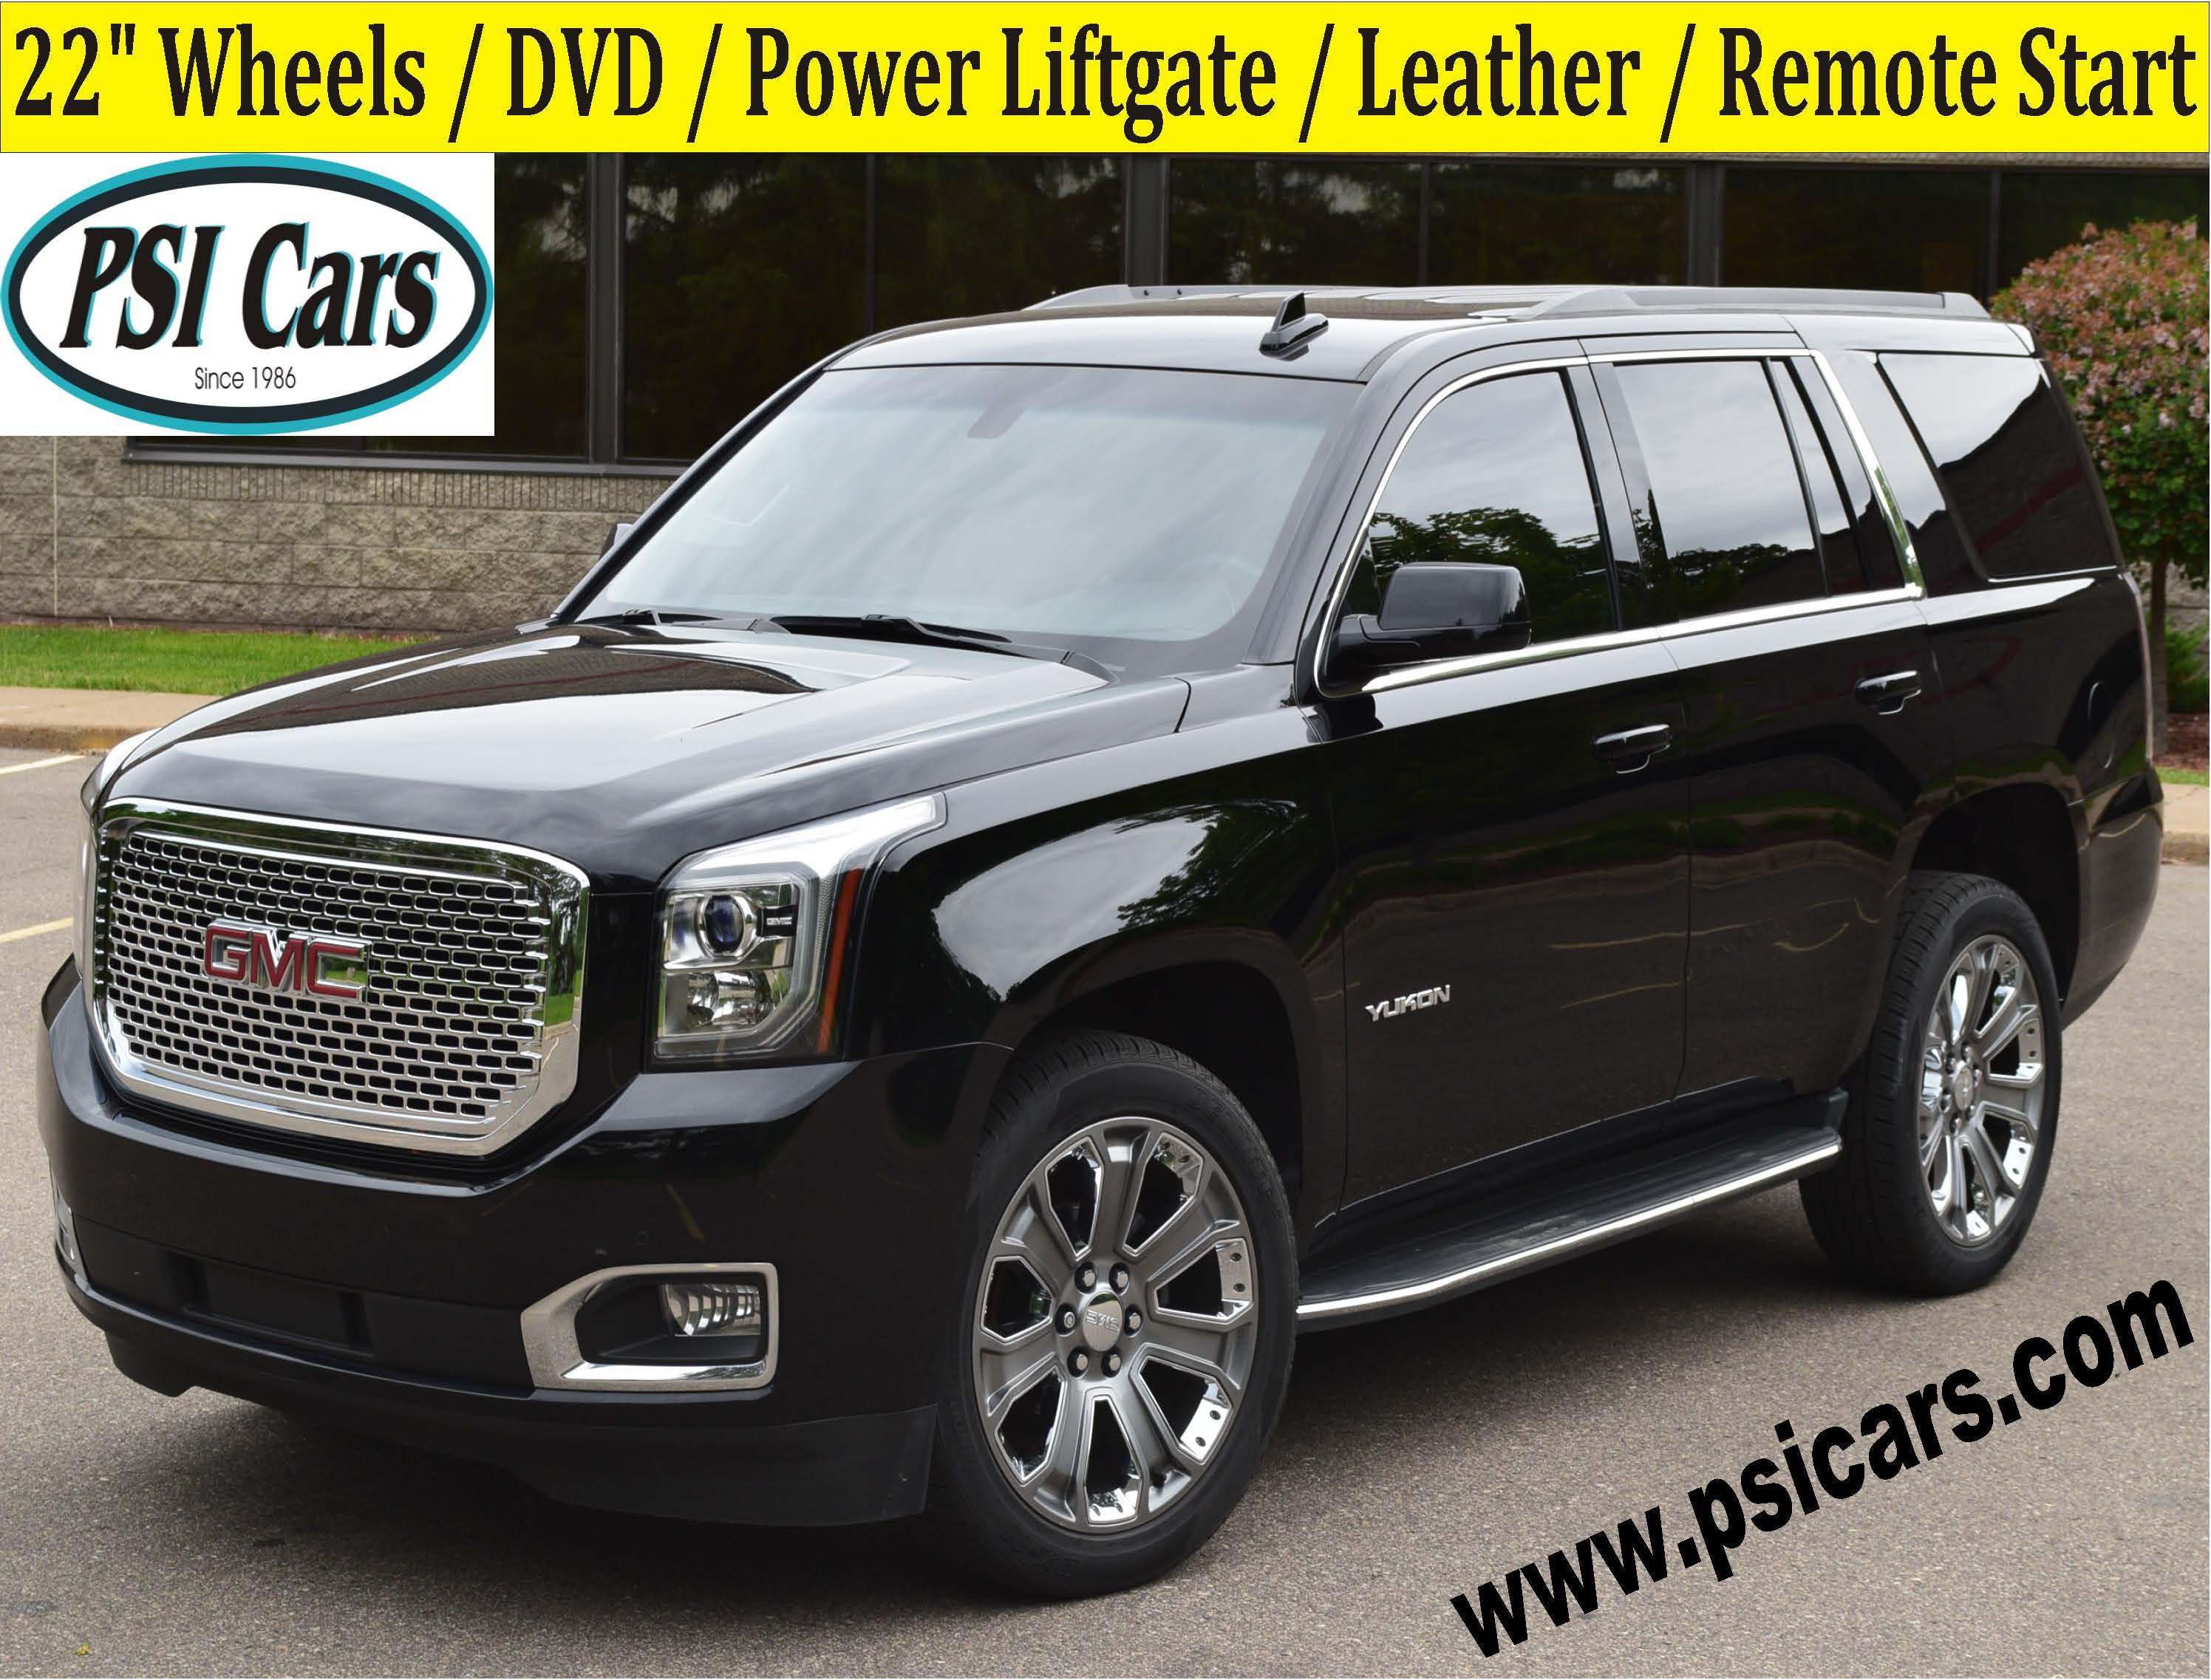 2016 GMC Yukon 22's / DVD / Power Liftgate / Leather /  SUV